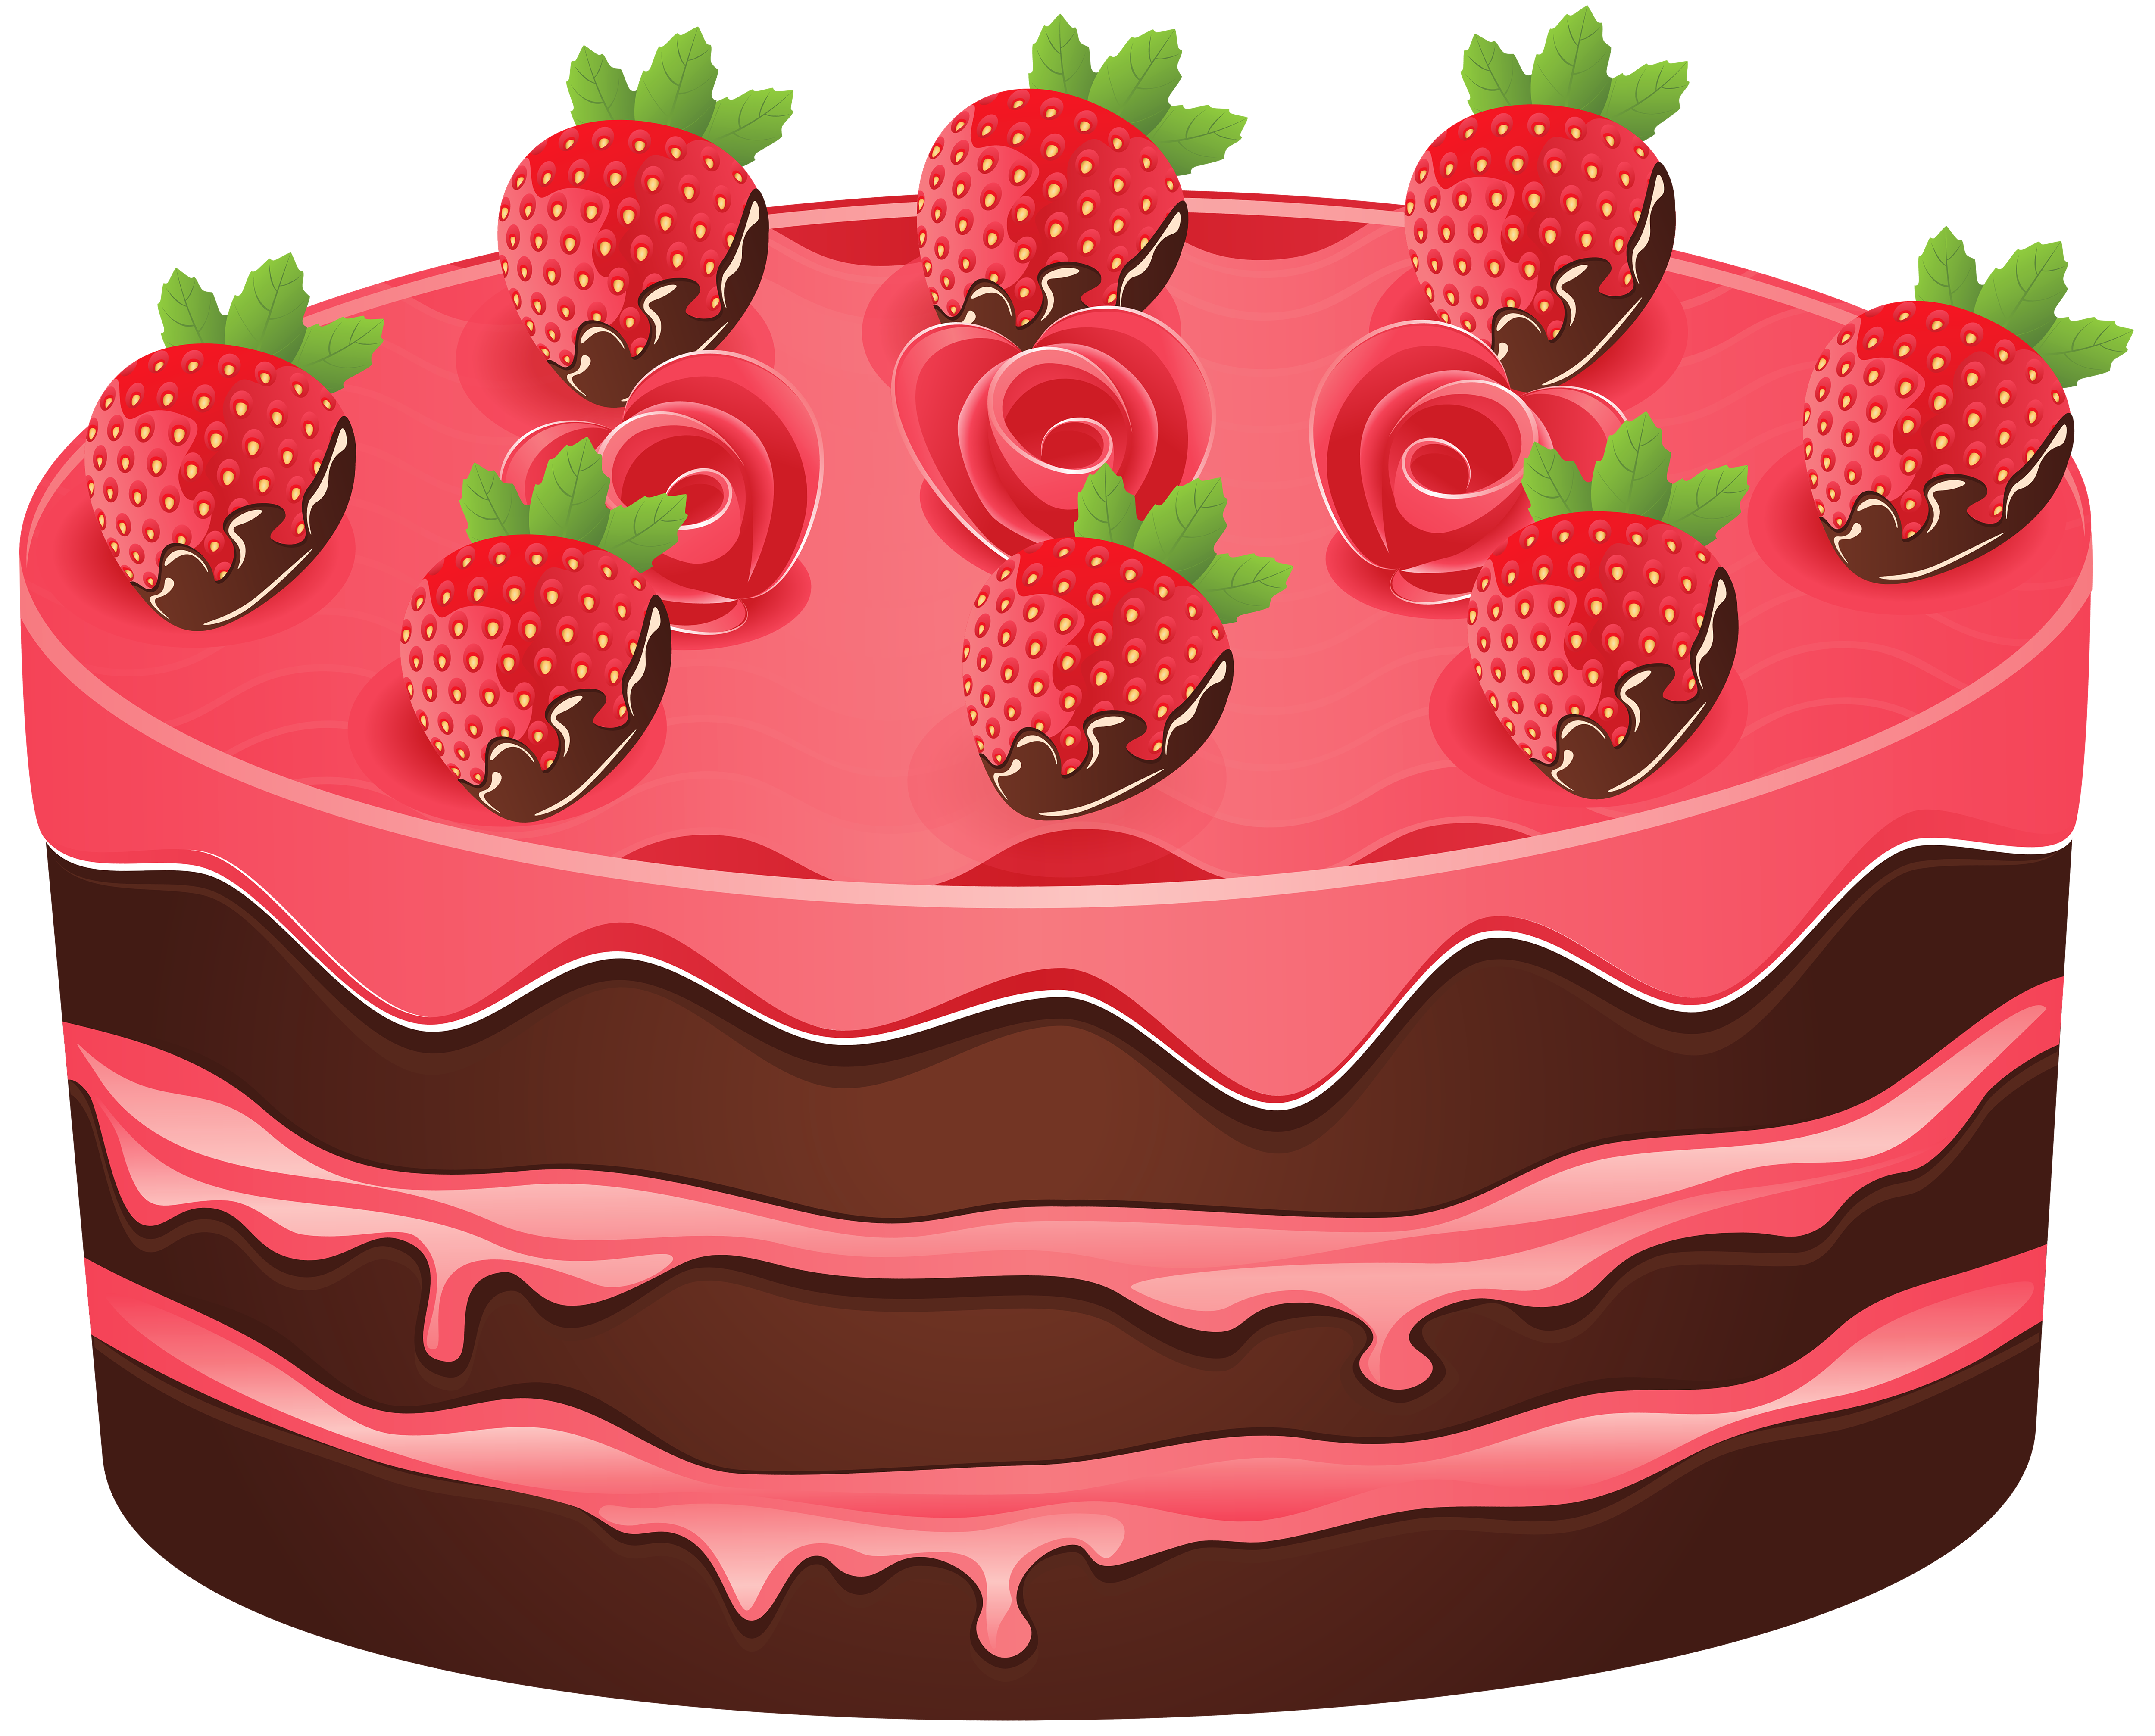 banner freeuse stock Baked goods clipart clip art. Birthday cake free on.